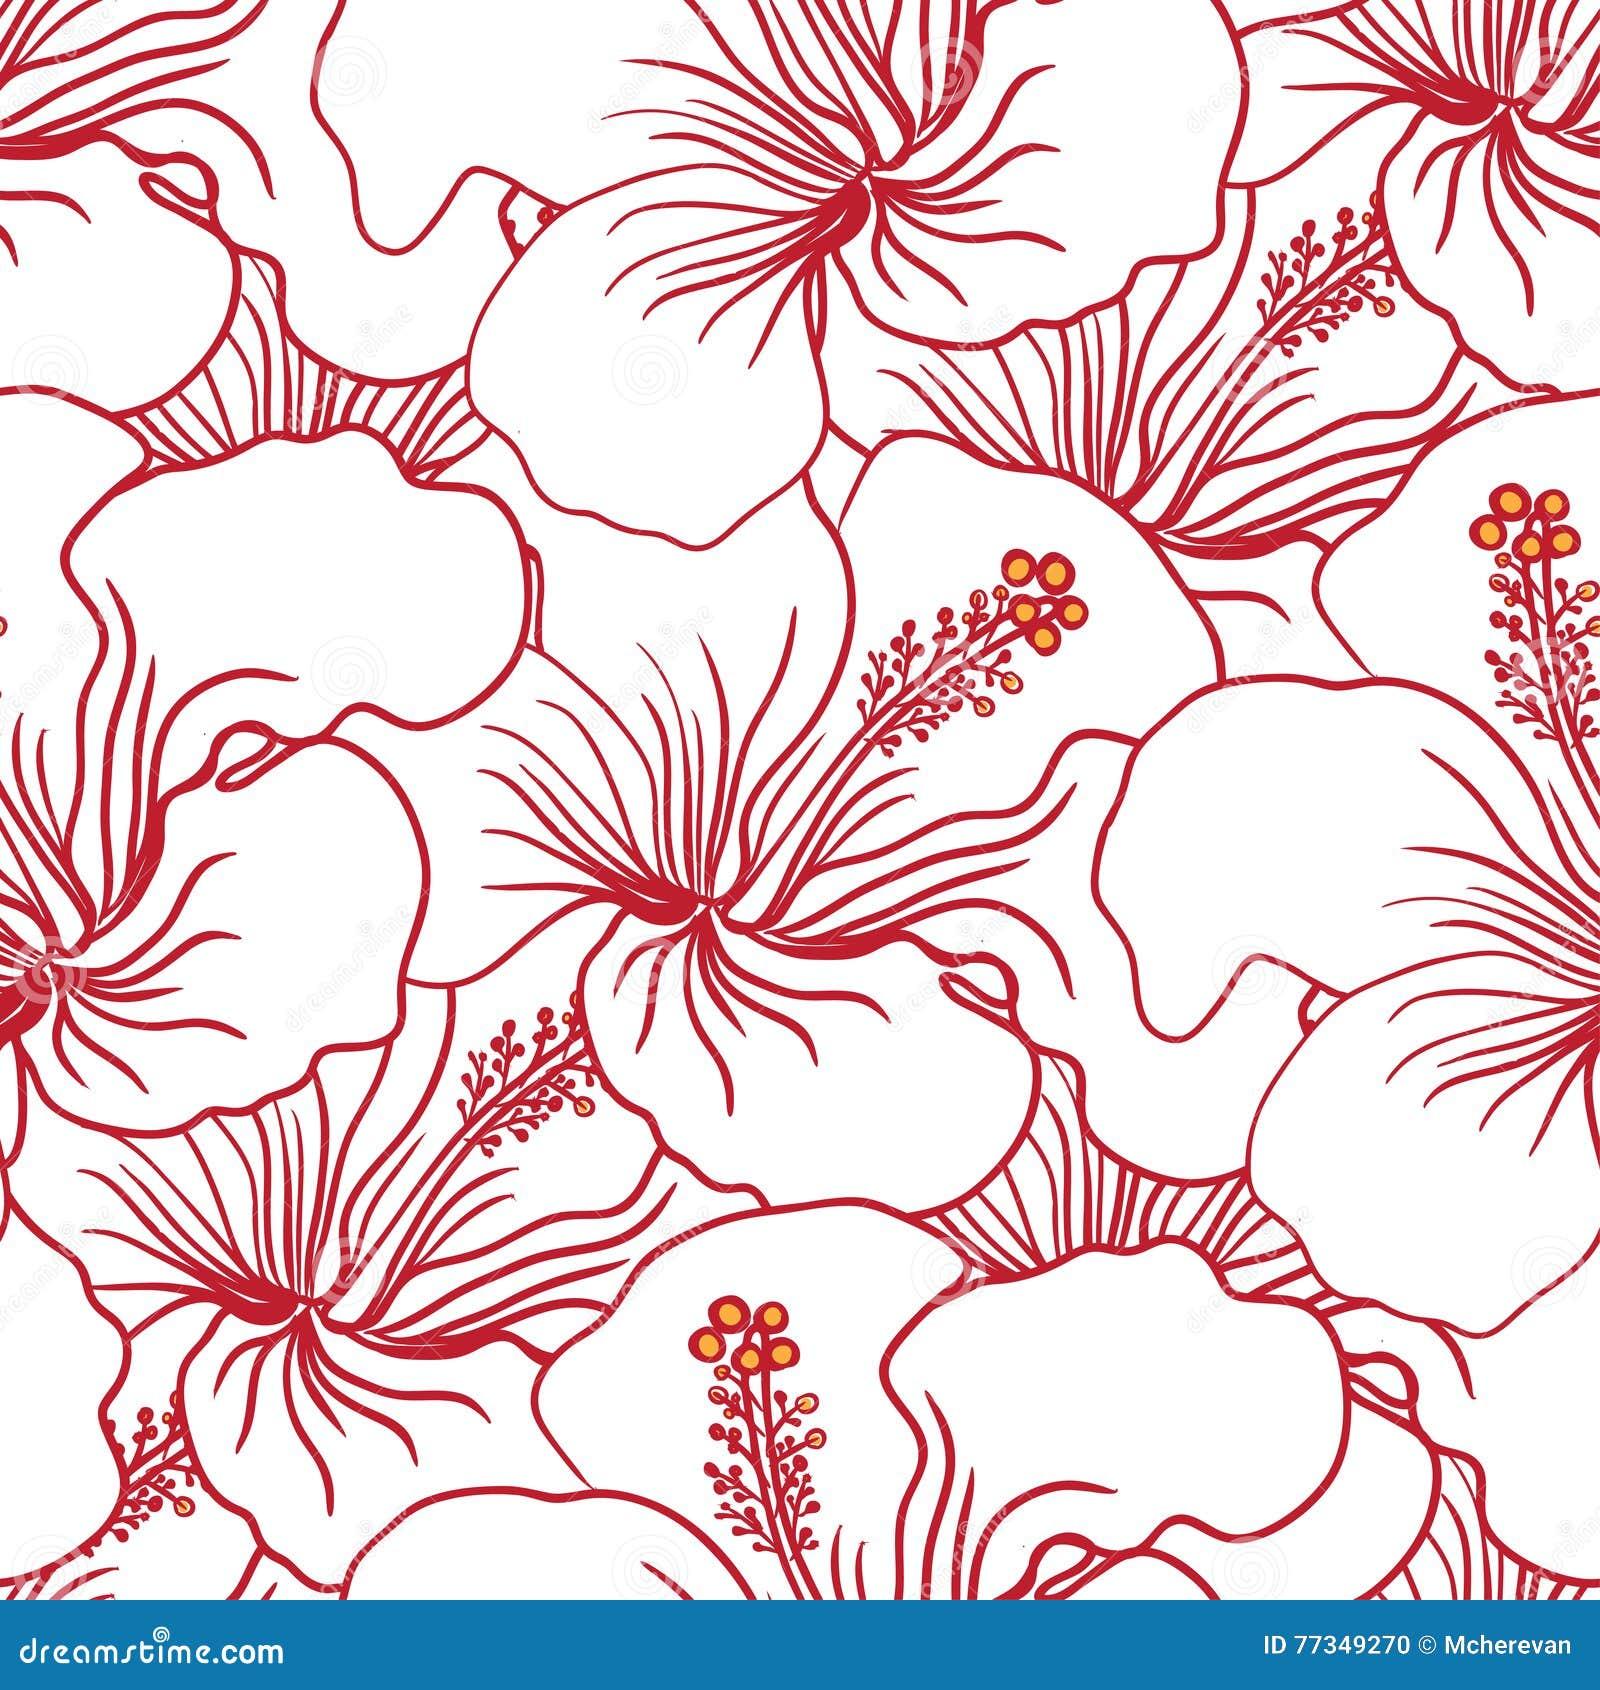 a6961e8bc033 Red and White Hibiscus Seamless Pattern. Hawaiian Aloha Shirt Background.